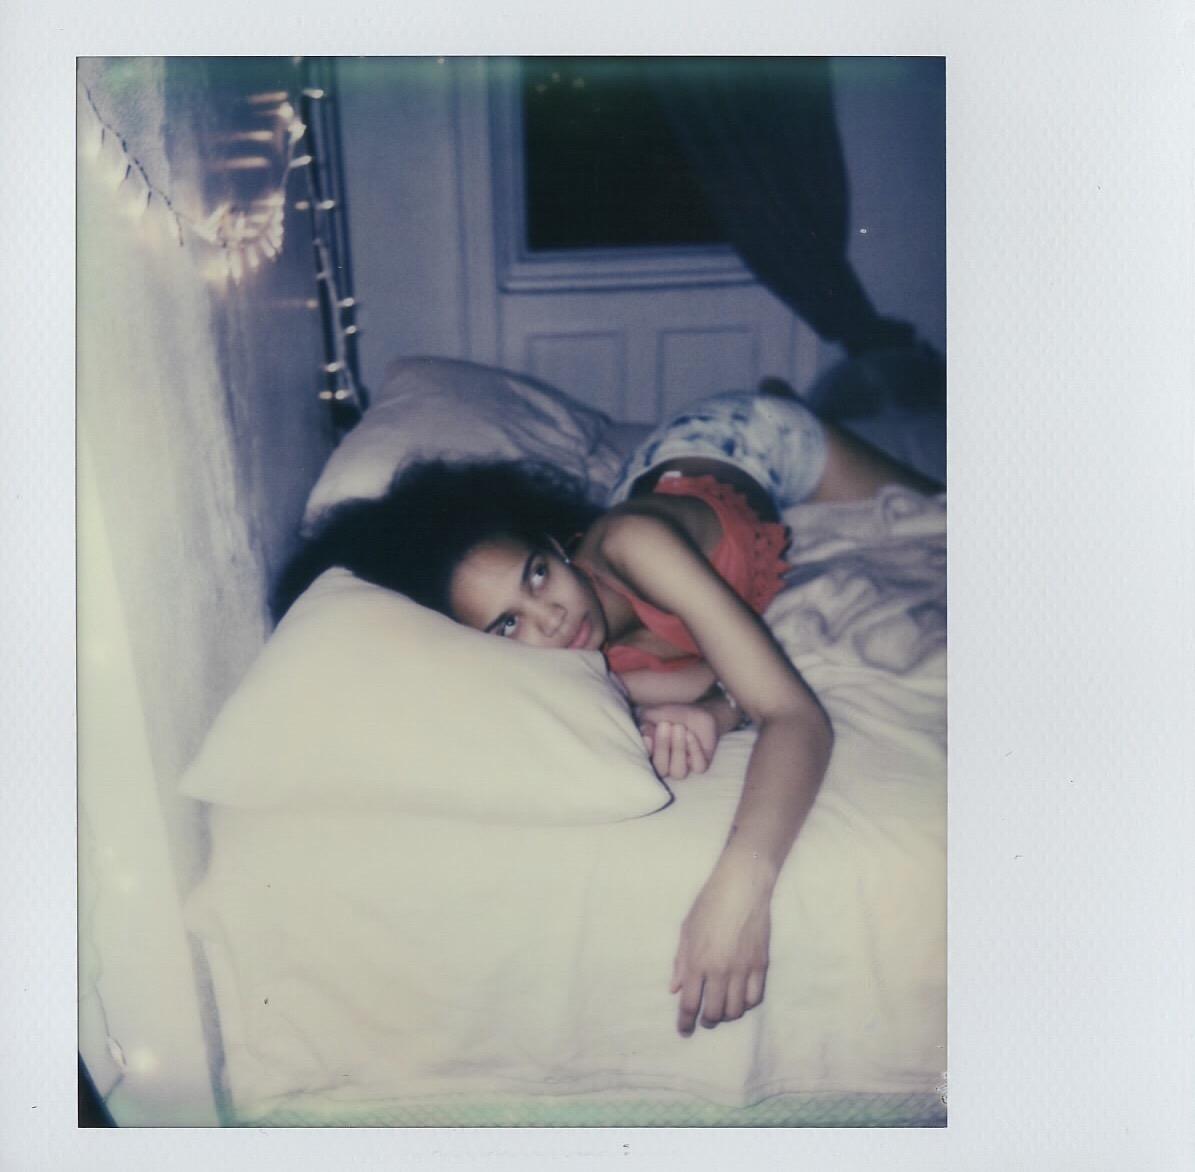 Anabel de Leon in her bedroom, shot on Polaroid Spectra film in Brooklyn, New York -- 2017